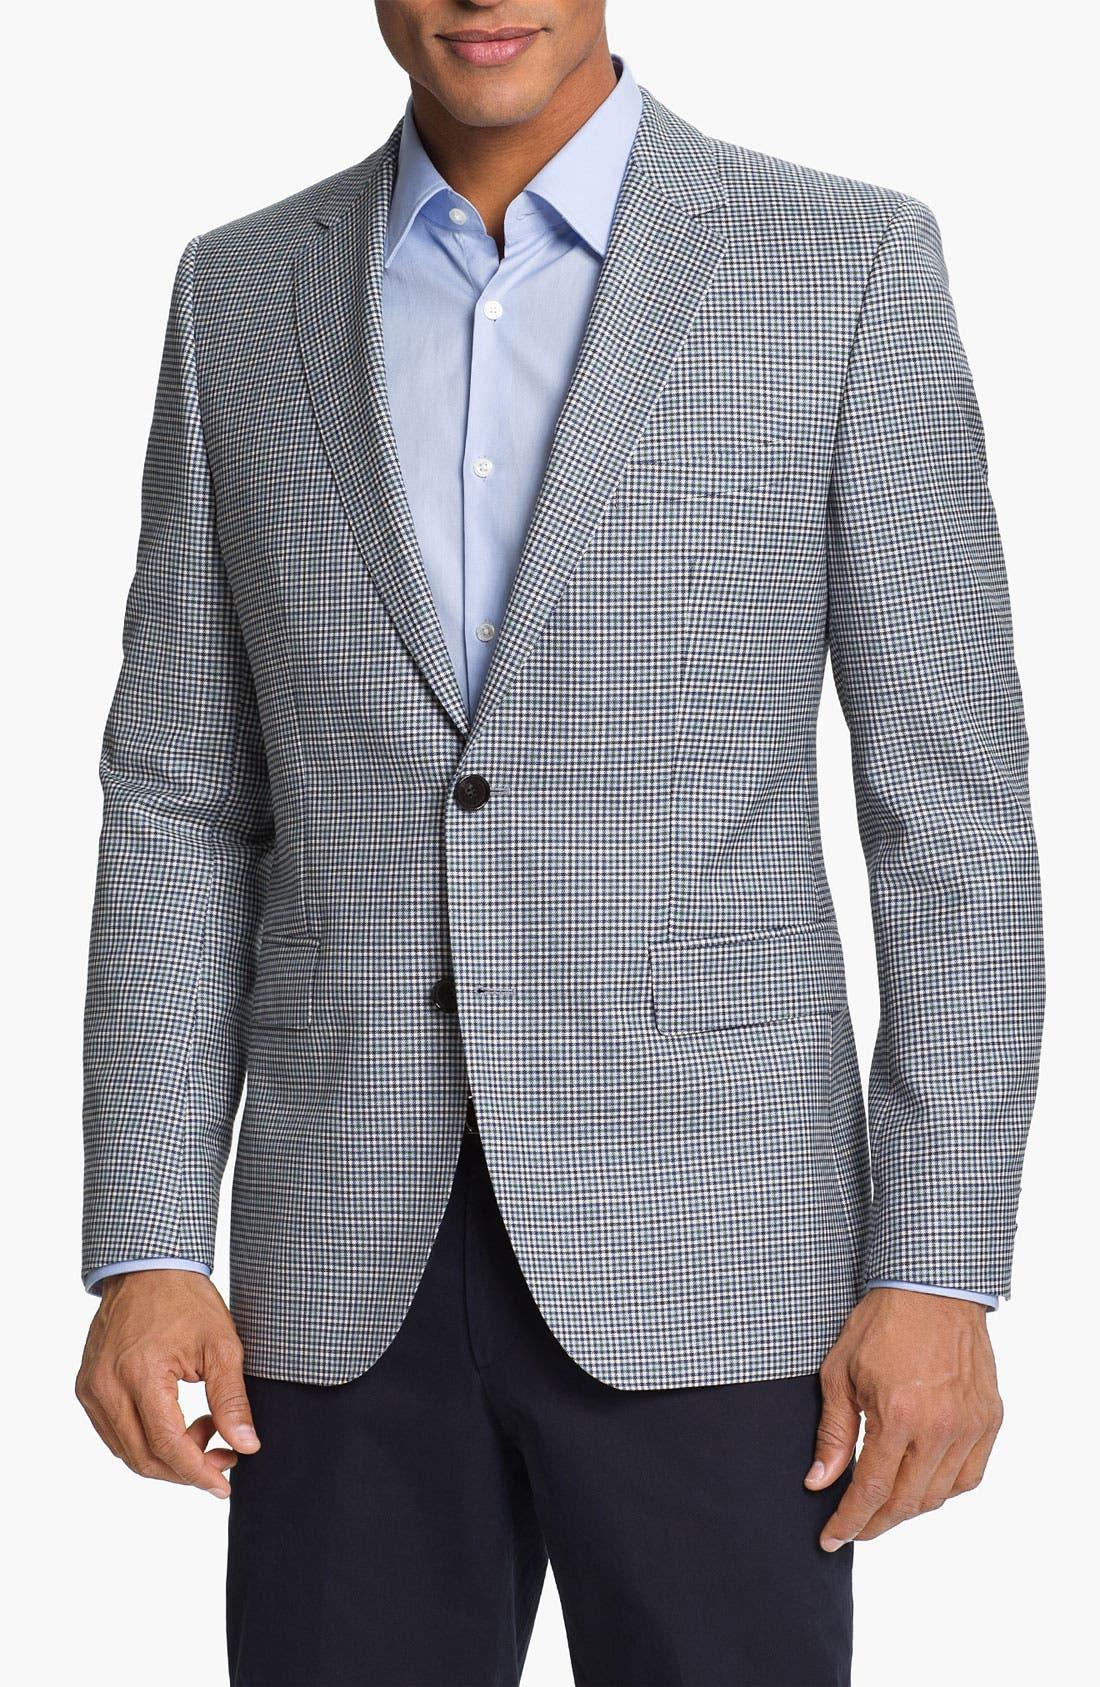 Alternate Image 1 Selected - BOSS HUGO BOSS 'James' Trim Fit Check Sportcoat